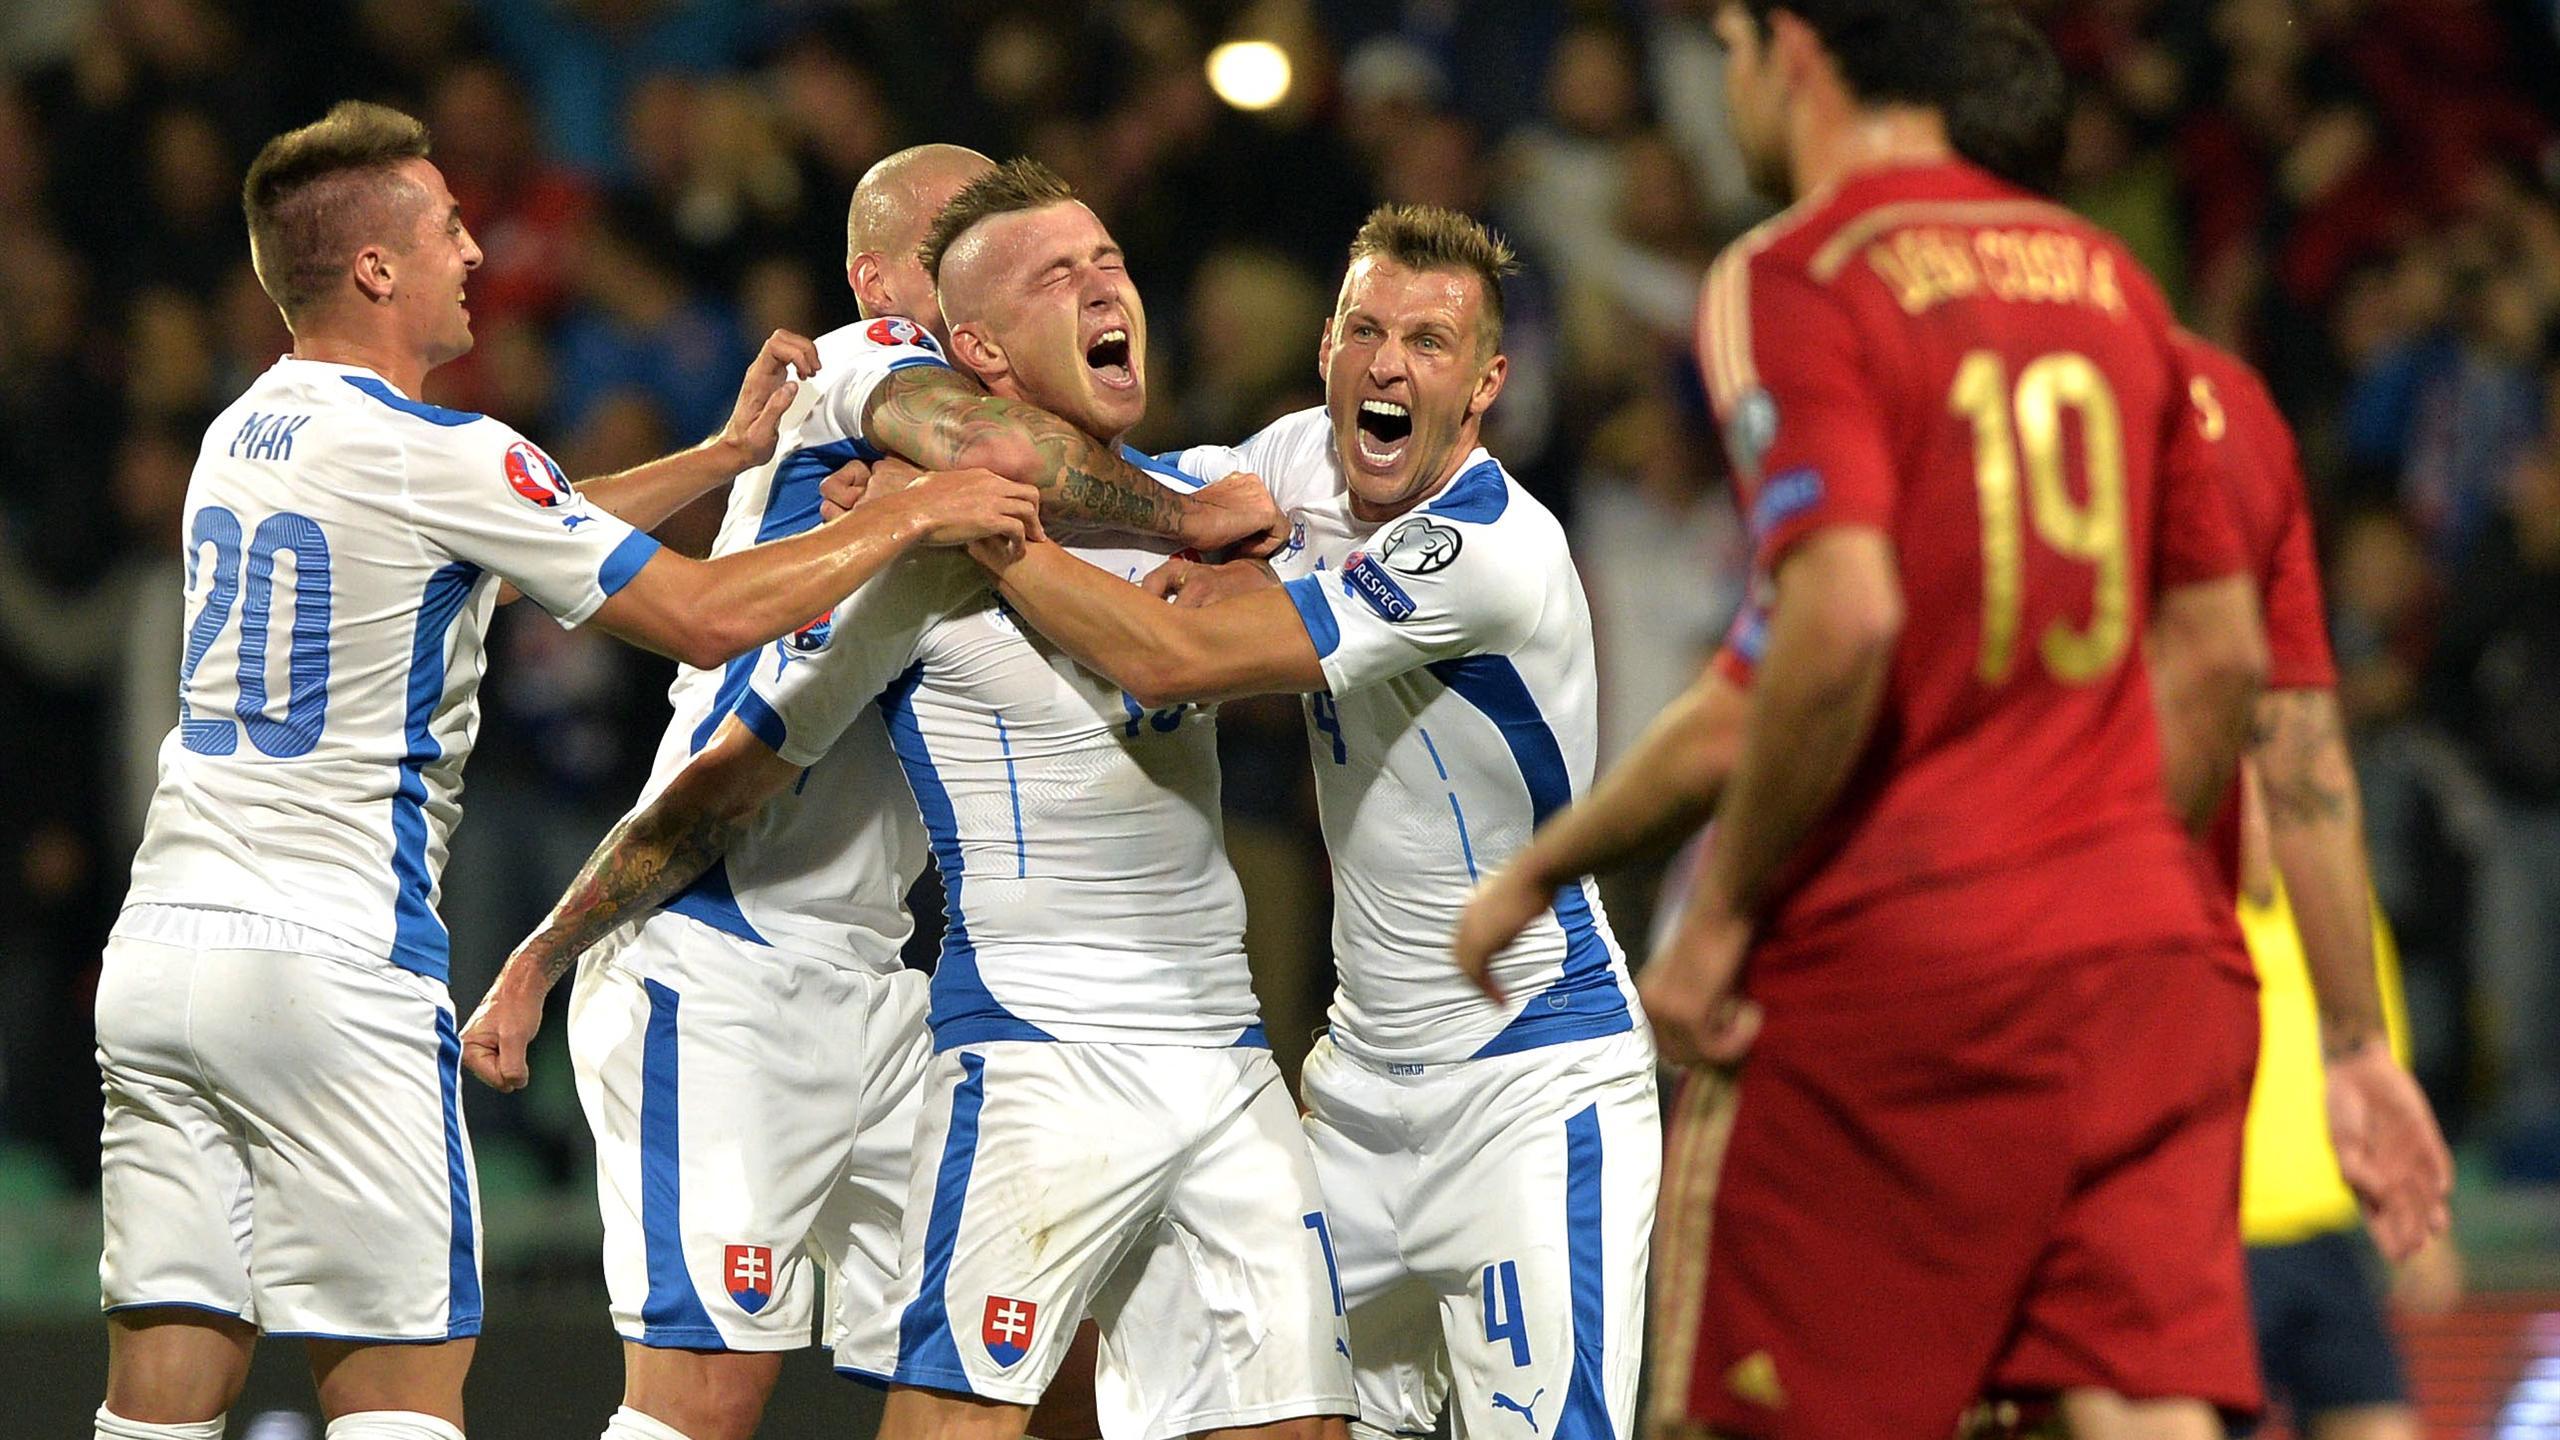 Video: Slovakia vs Tây Ban Nha